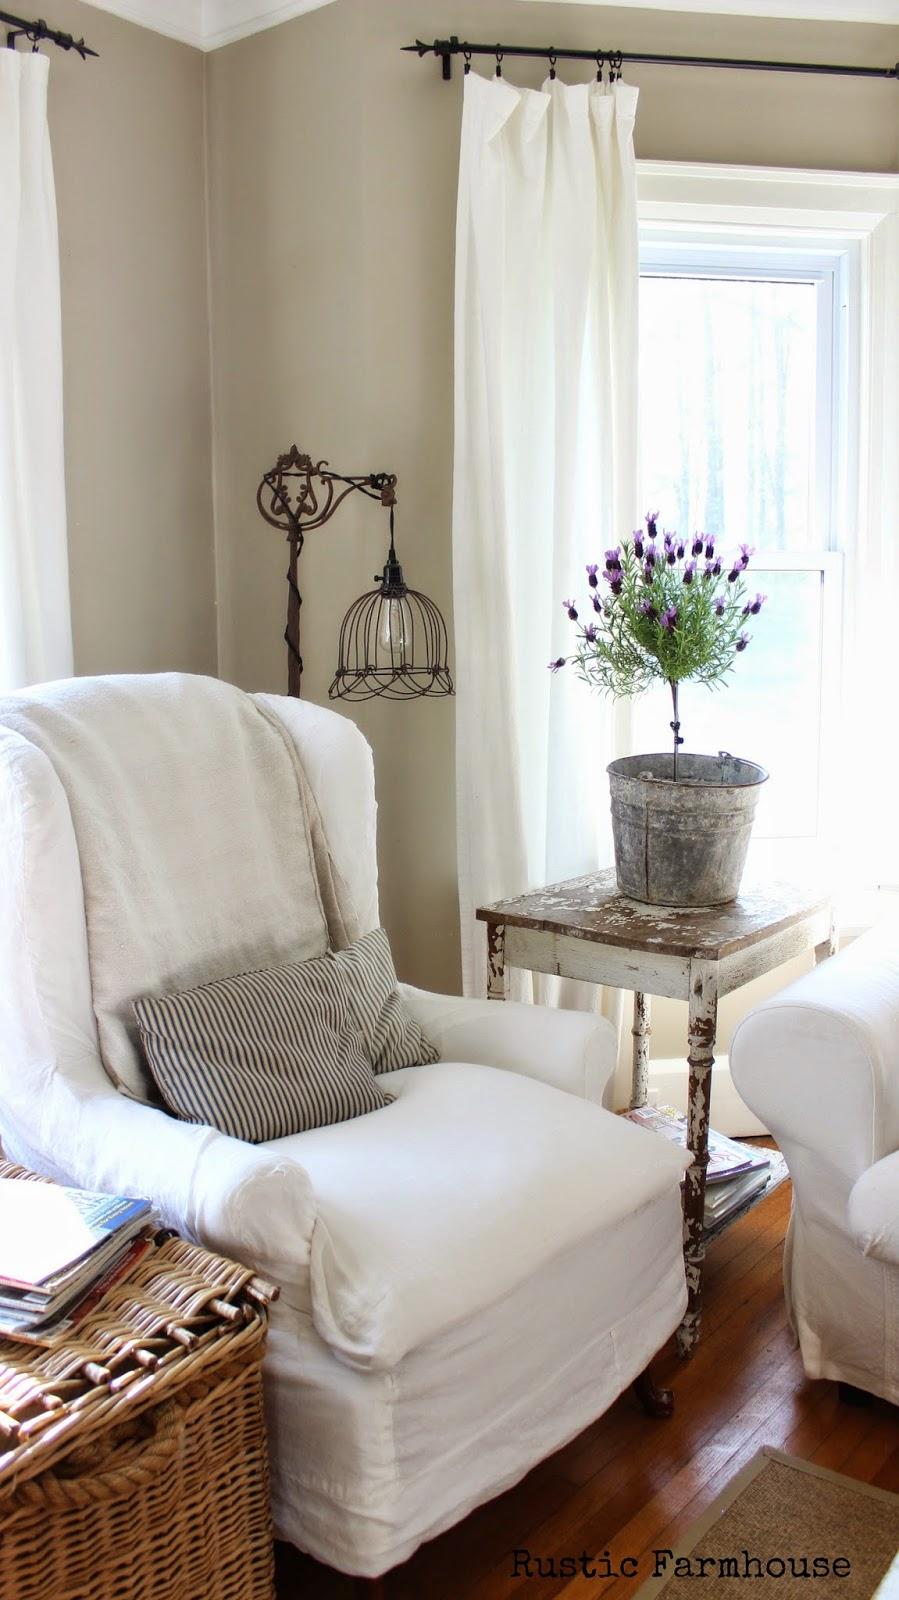 Rustic Farmhouse: Happy Mother's Day! on Farmhouse Living Room Curtain Ideas  id=35690